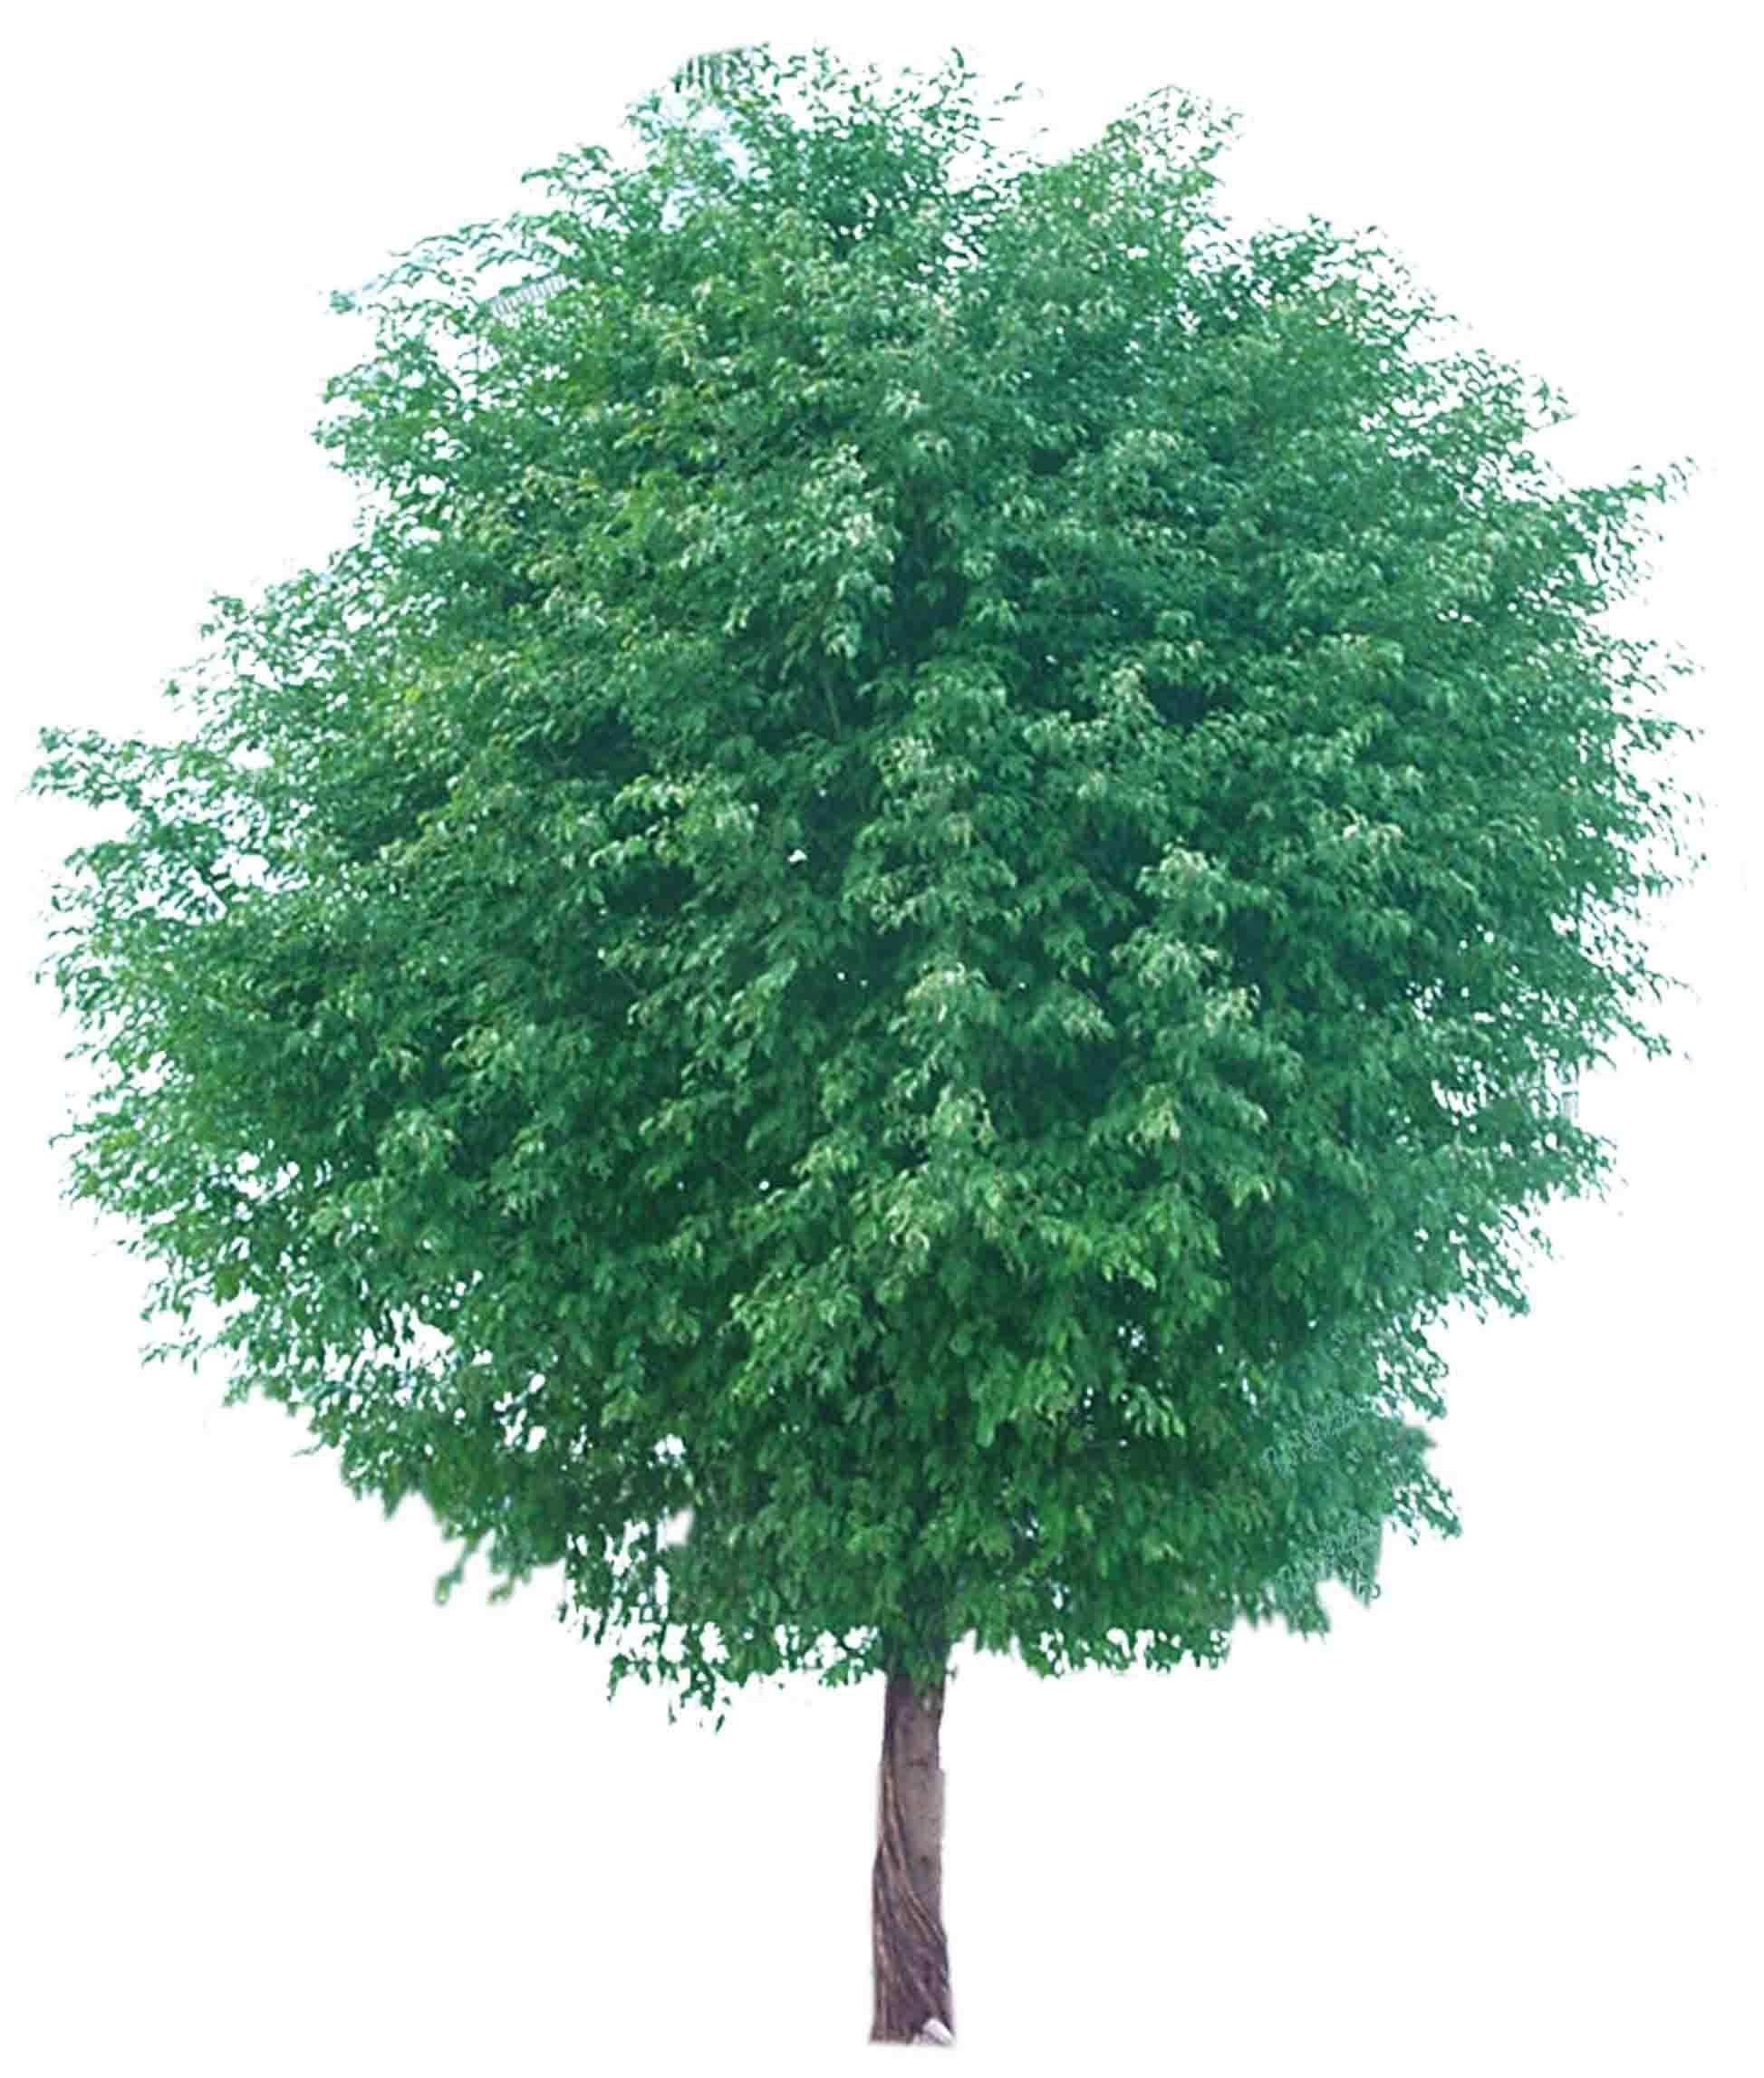 ps手绘树木